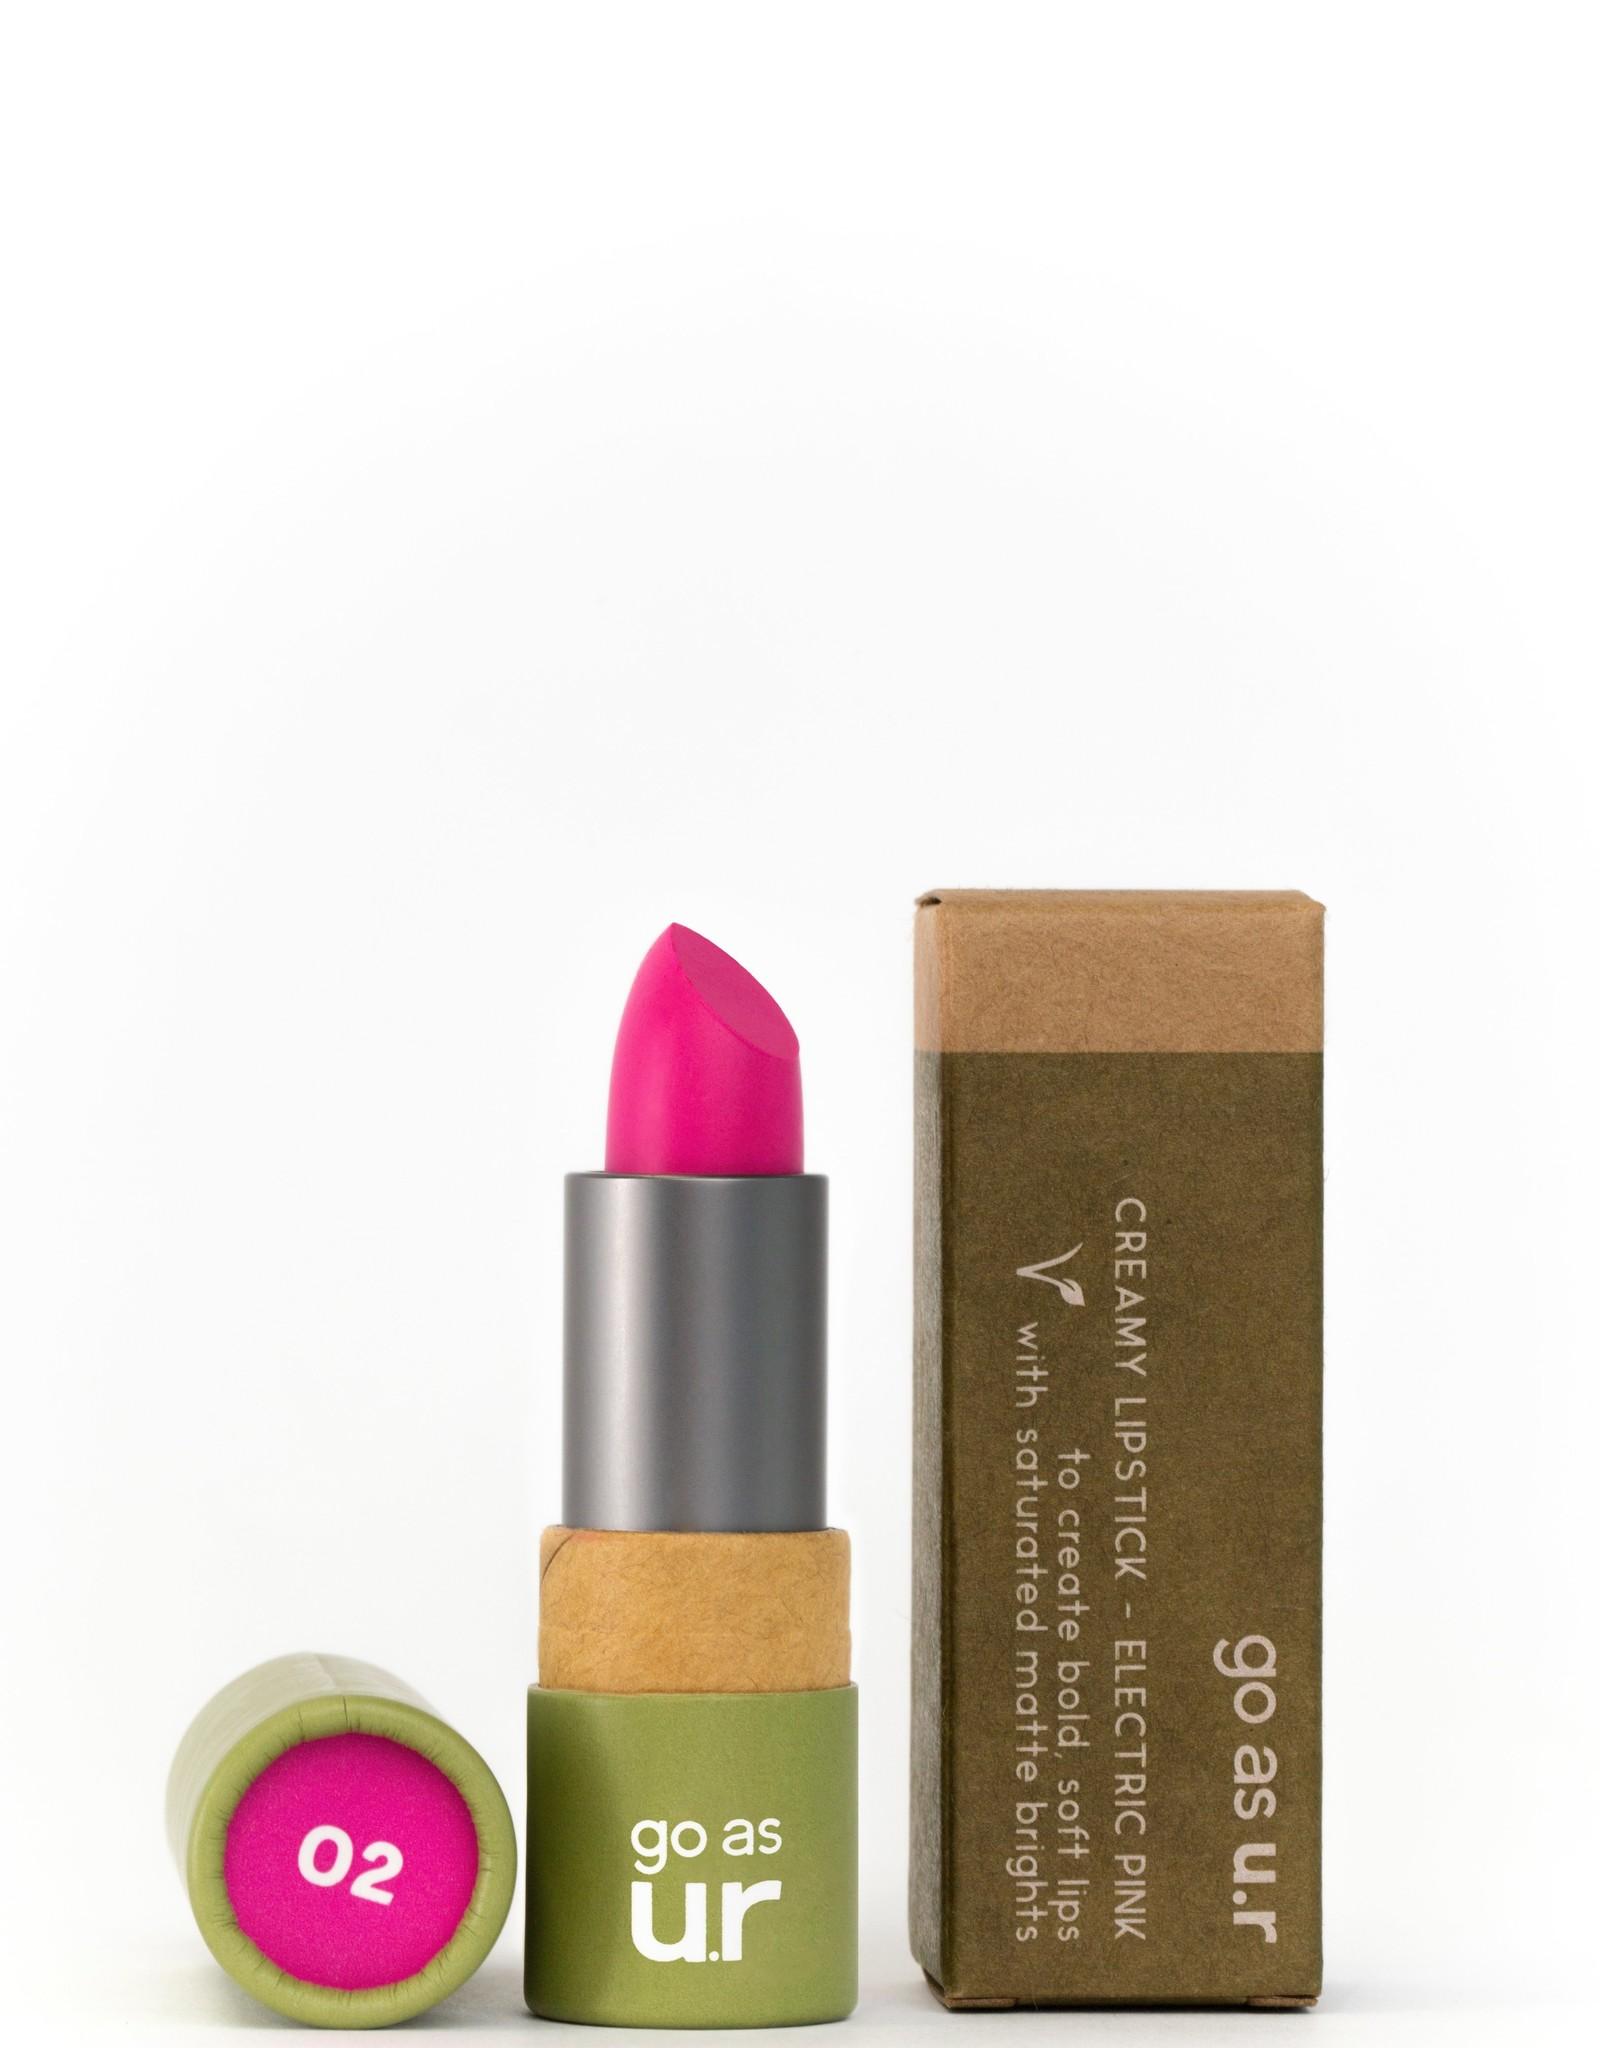 Go as ur Vegan Lipstick Electric Pink